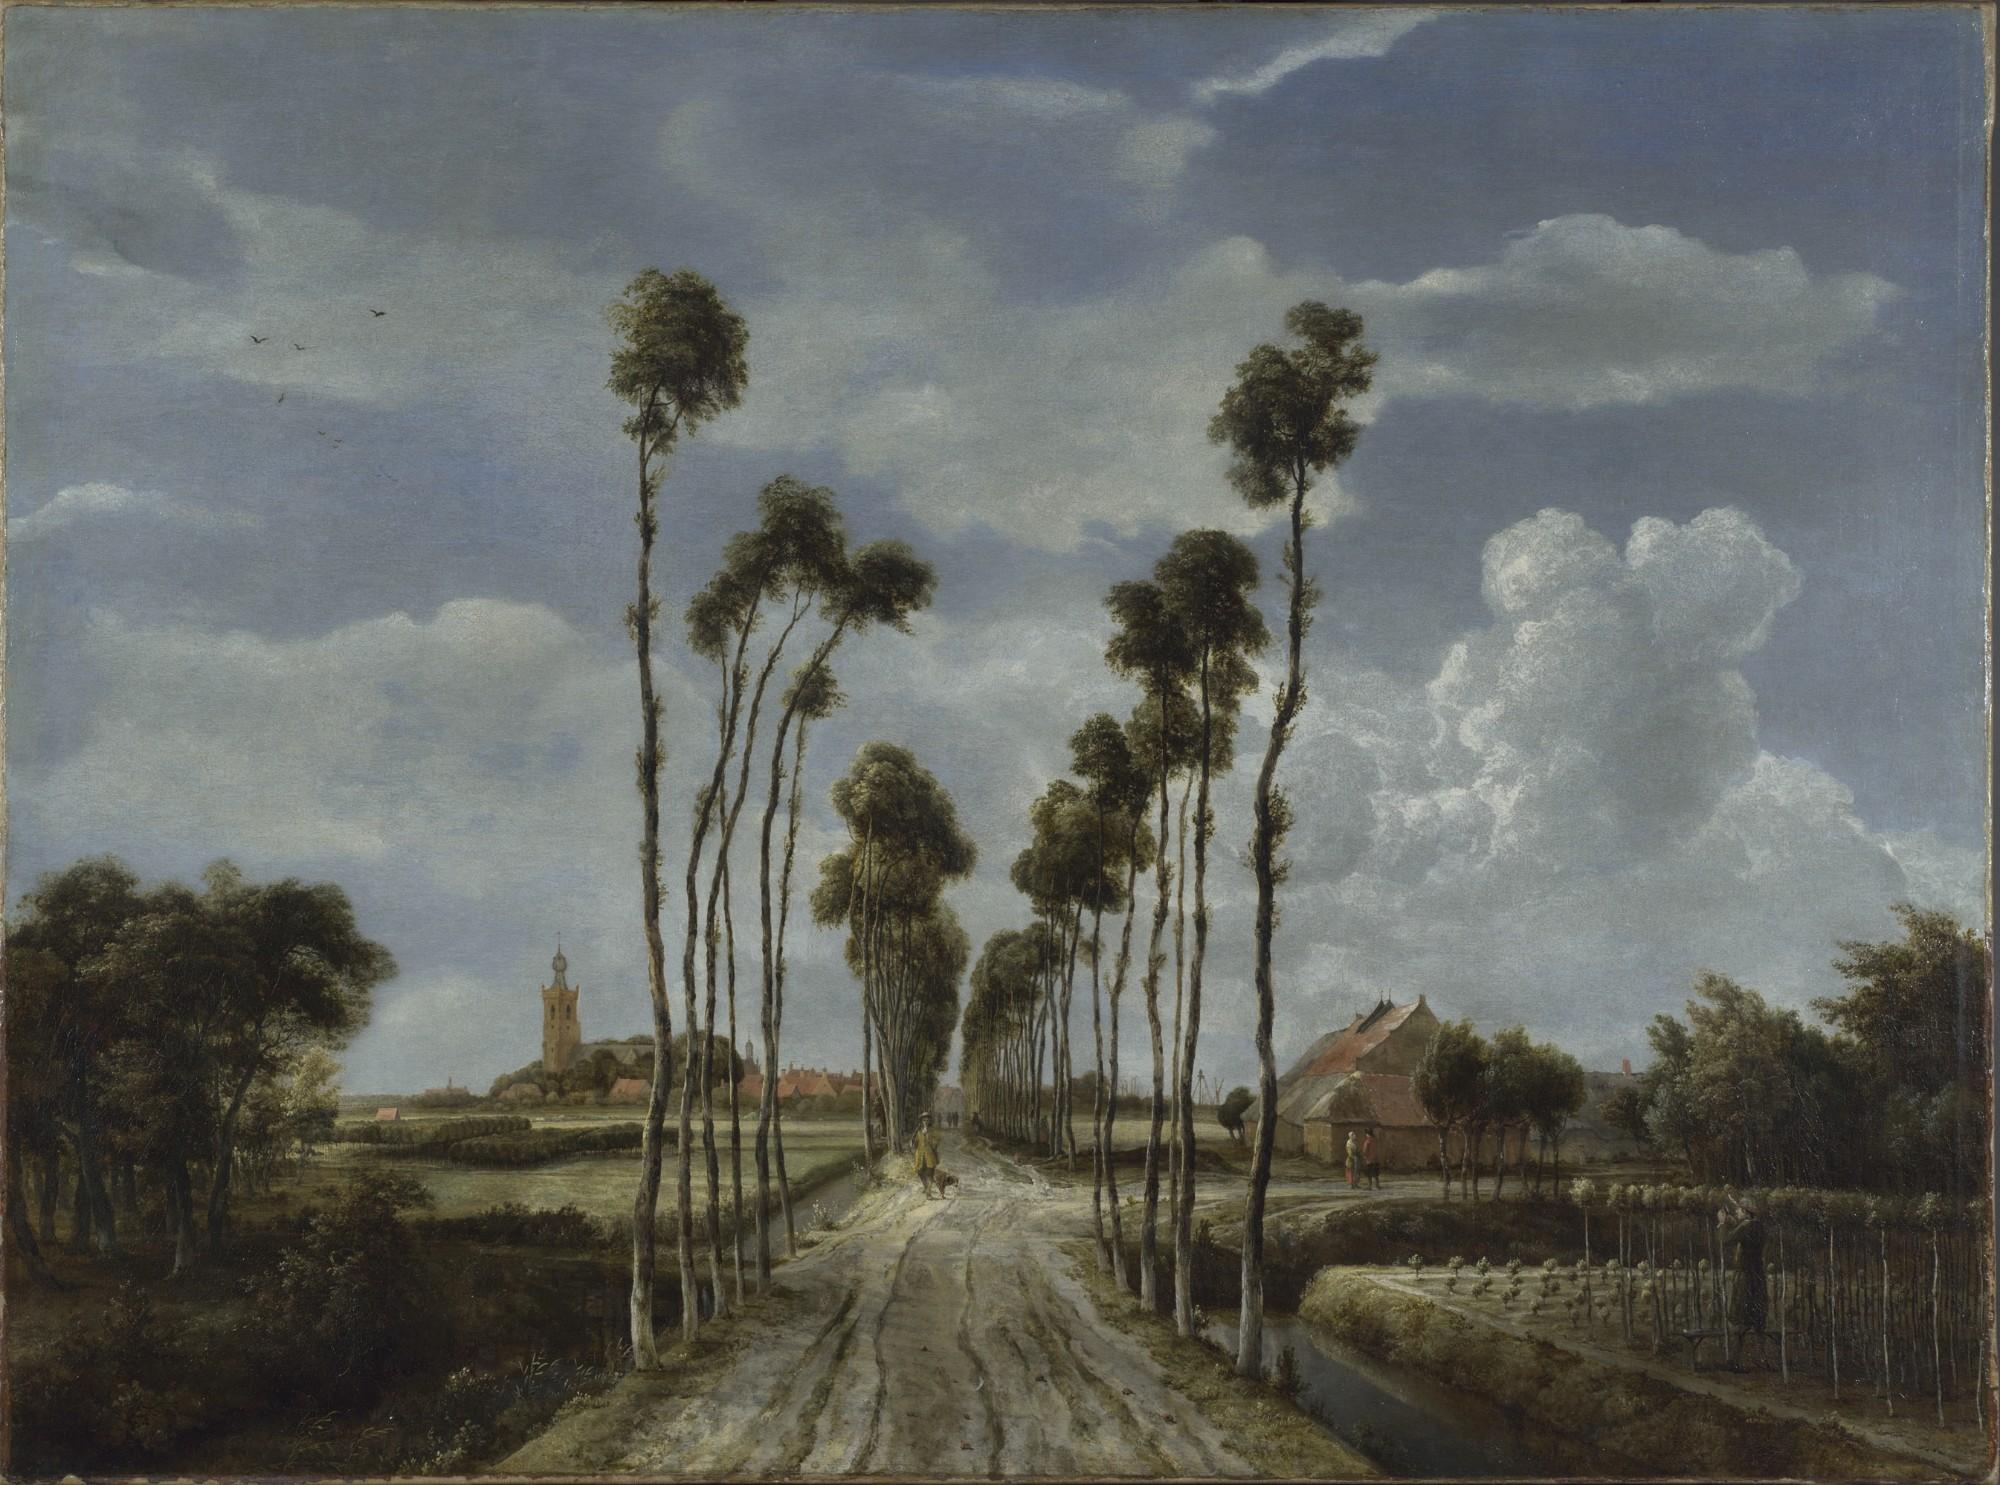 Meindert Hobbema - The Avenue at Middelharnis 1689